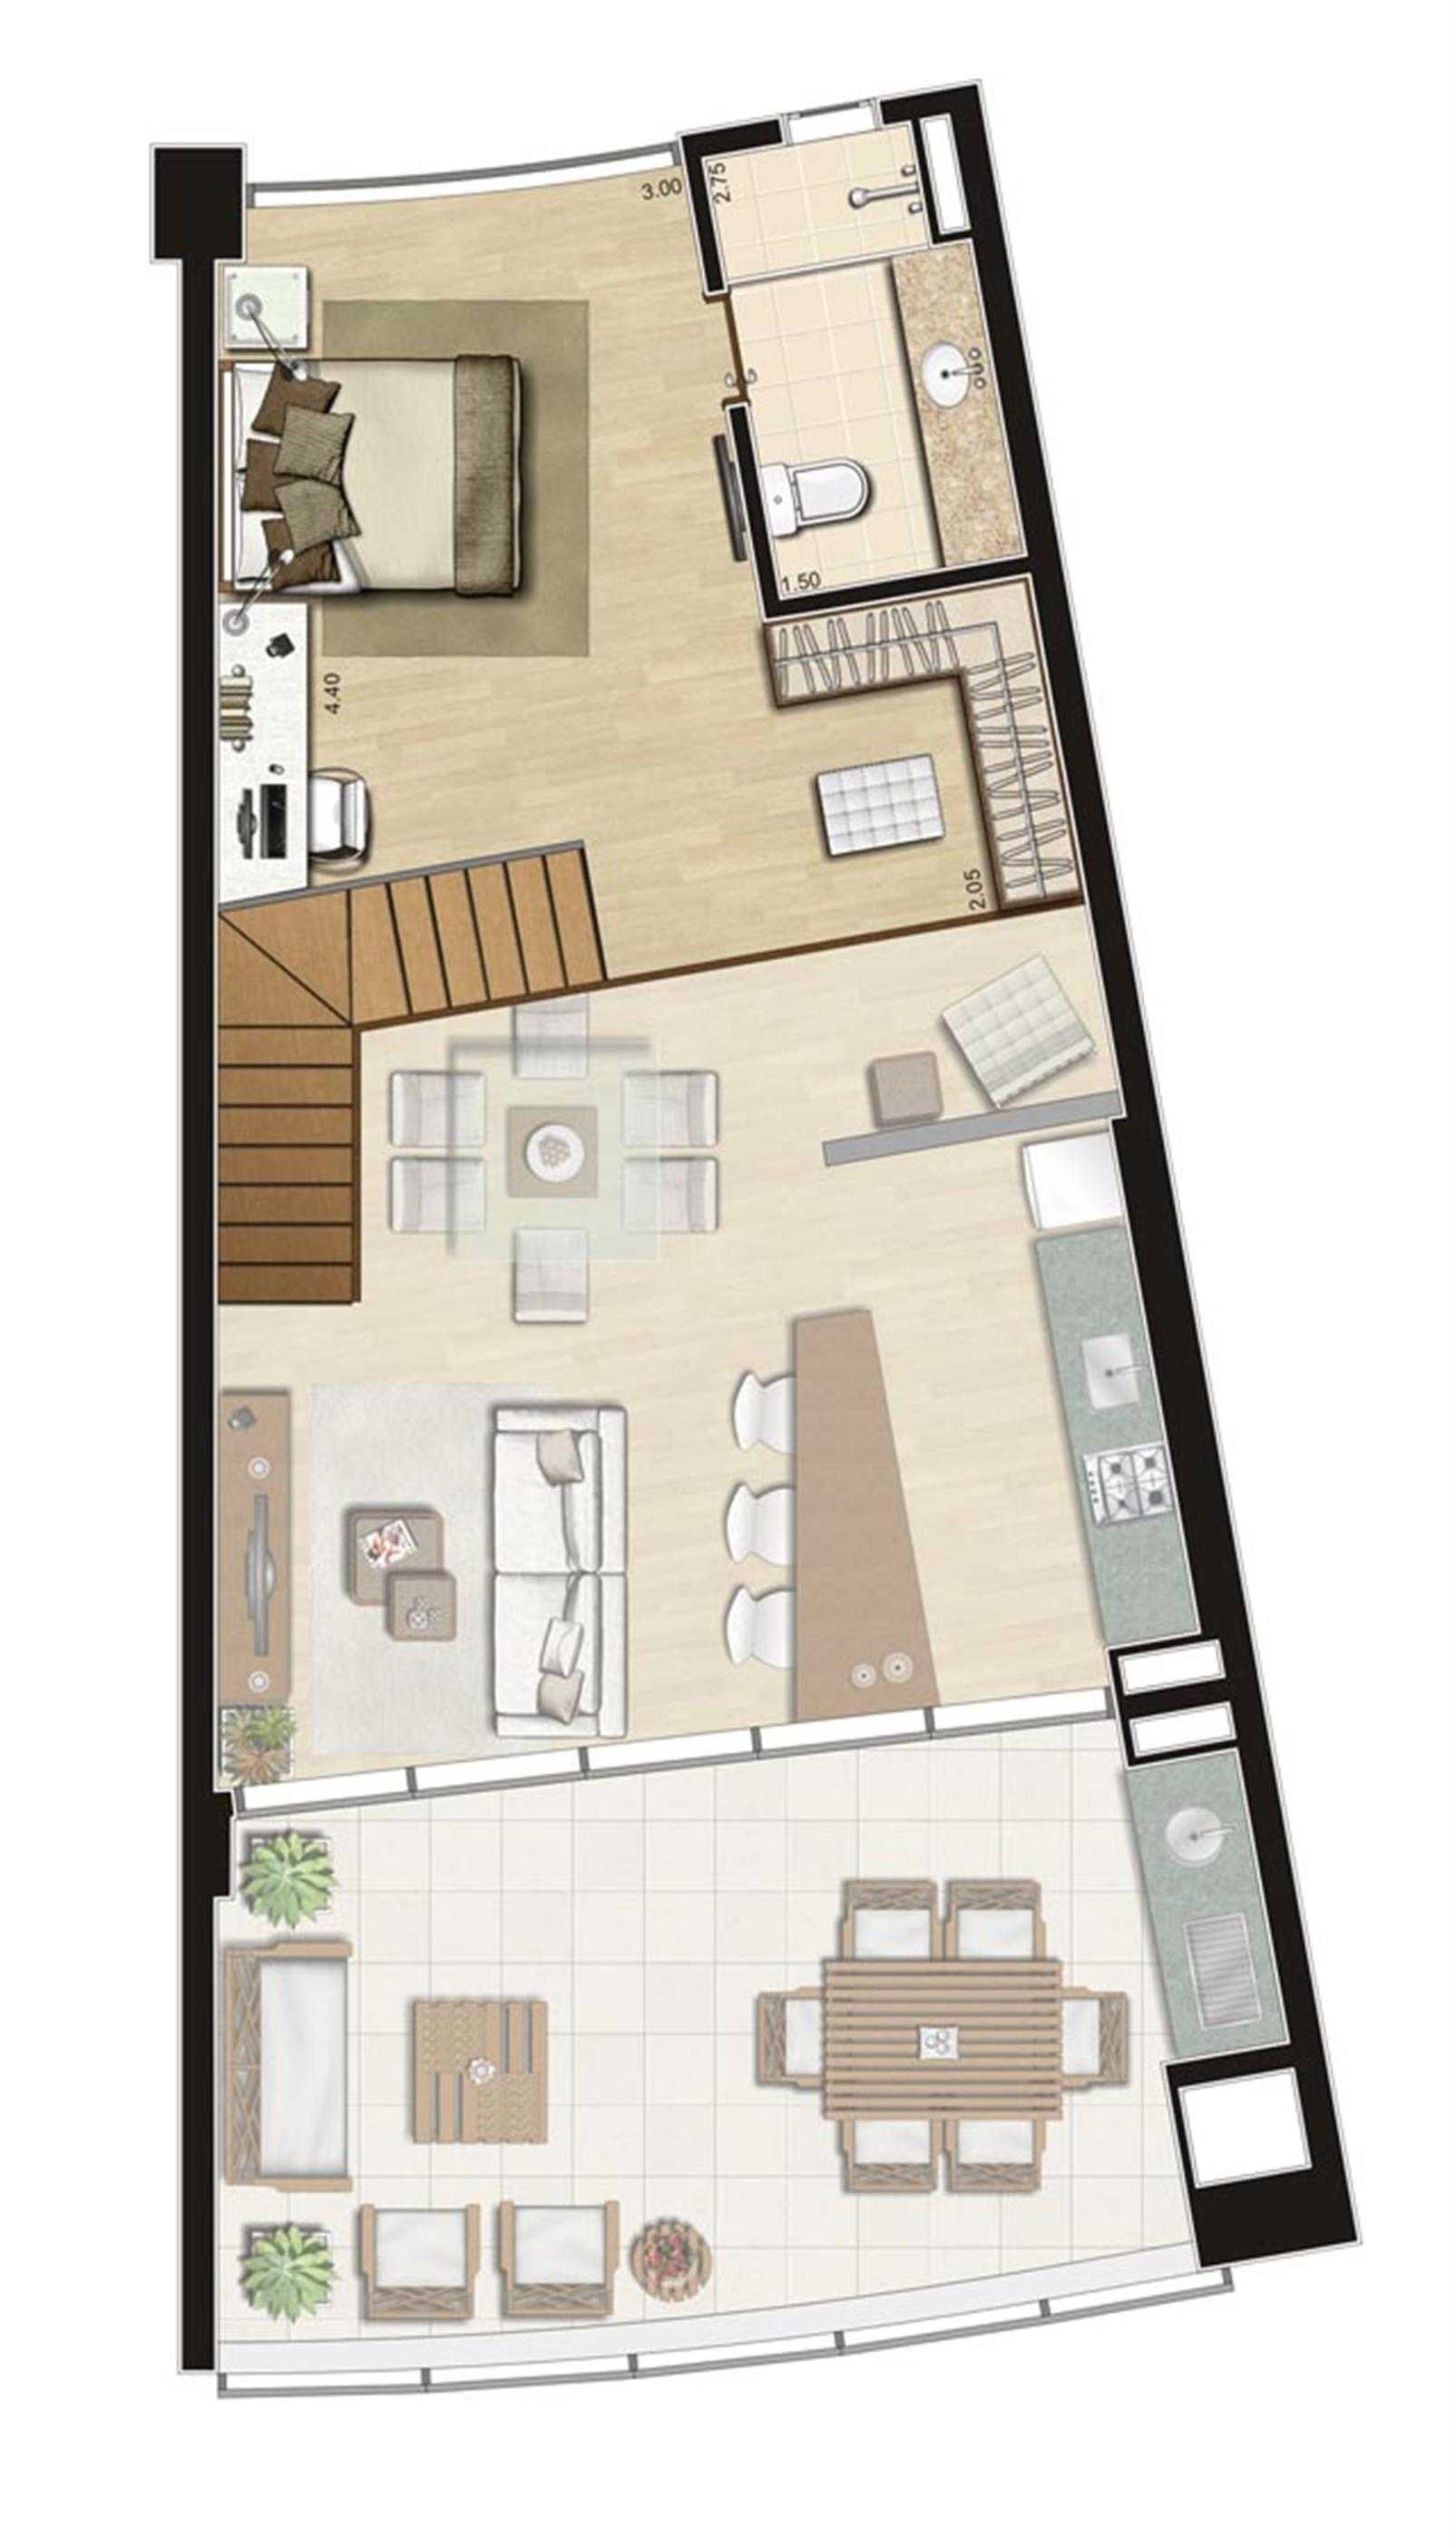 Duplex de 111m² privativos Superior | Thera Residence – Apartamentona  Berrini - São Paulo - São Paulo